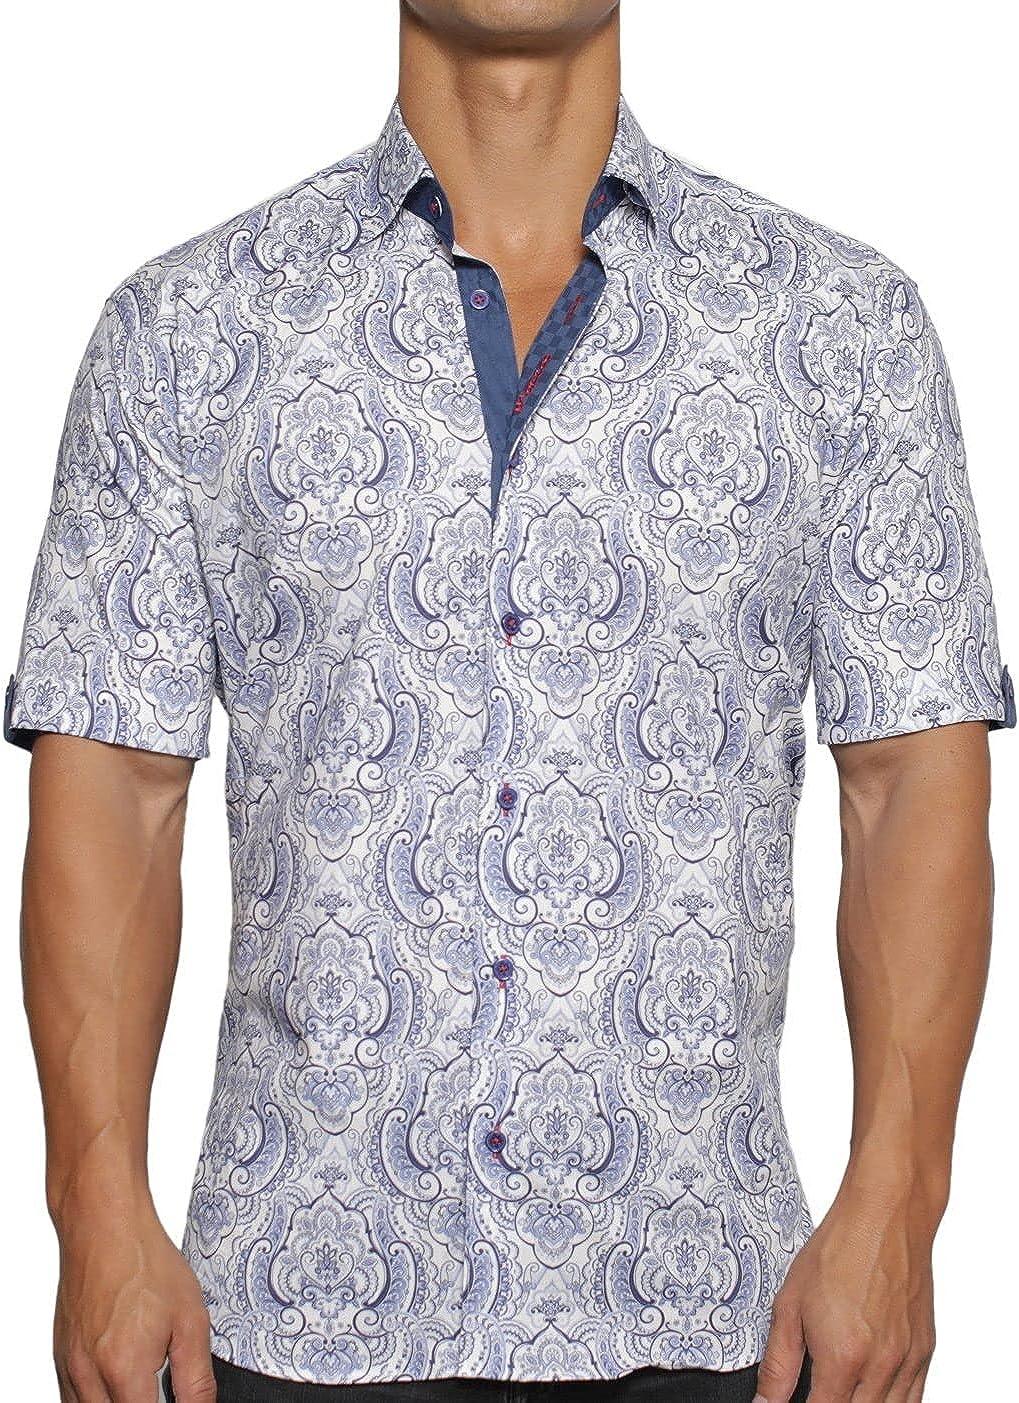 Maceoo Mens Designer Dress Shirt SS - Stylish & Trendy - Galileo Royal White - Shaped Fit